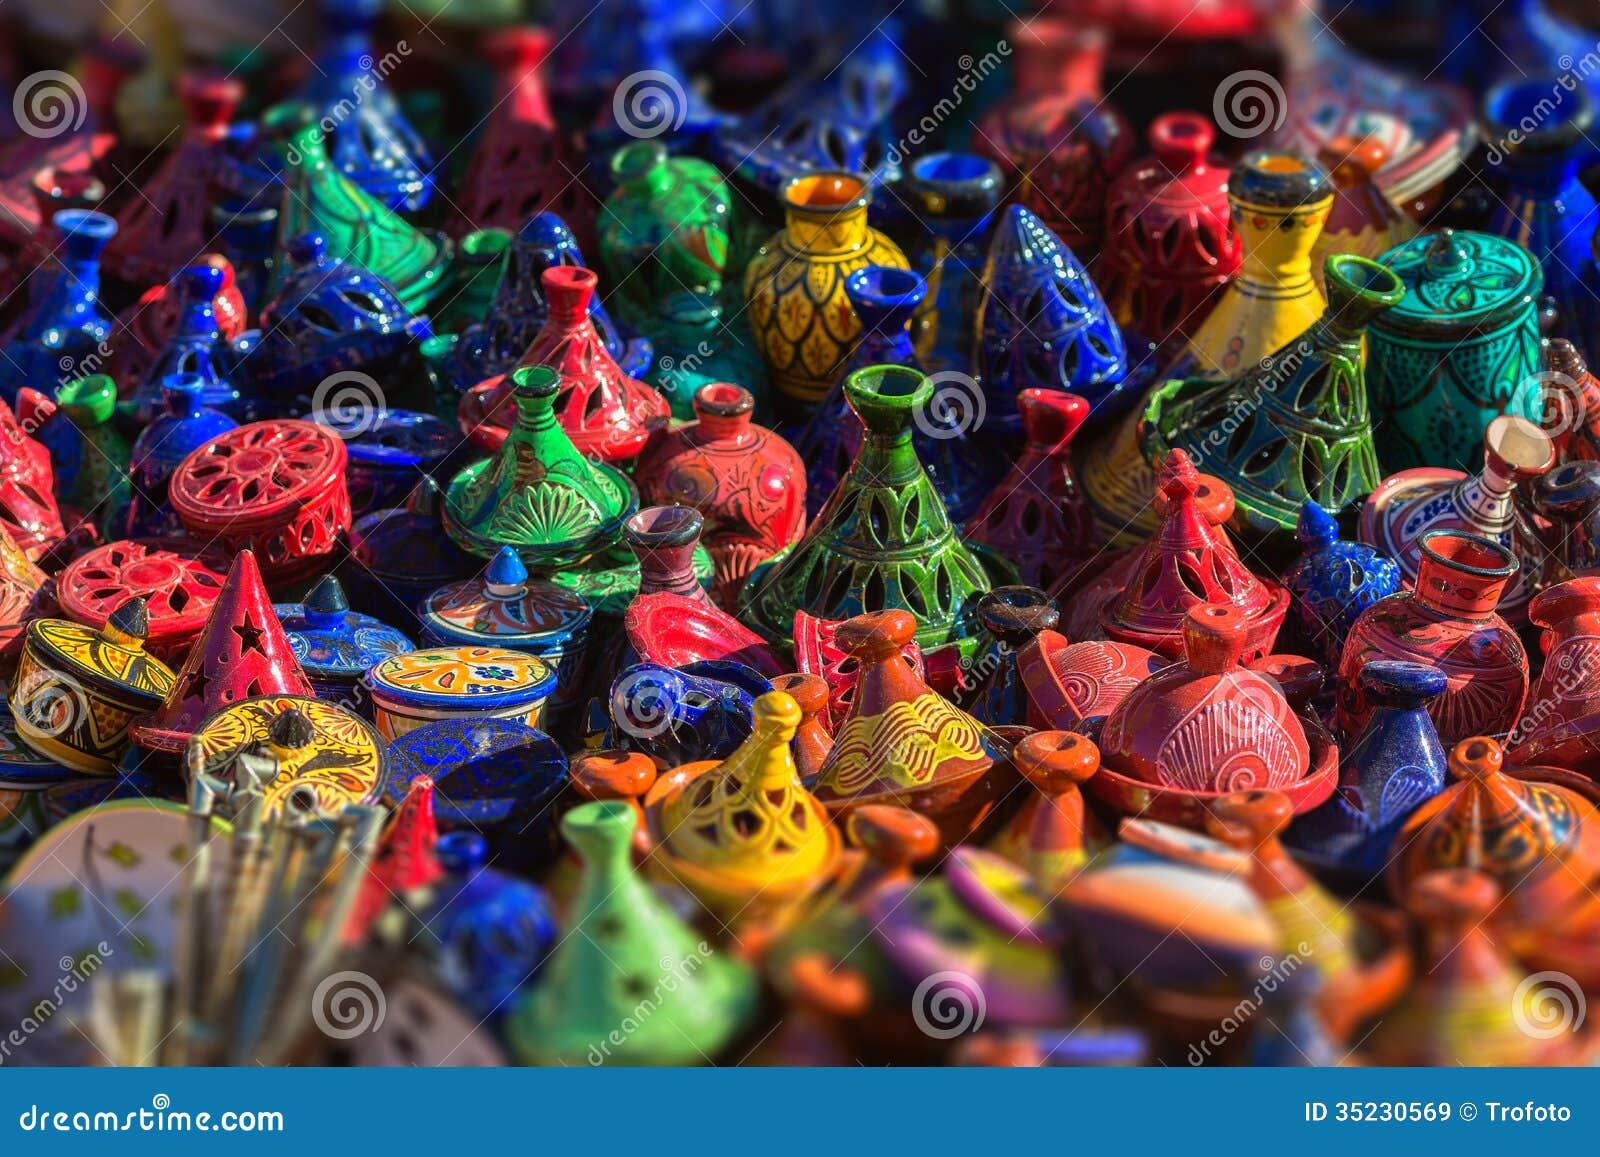 morocco wallpaper related keywords - photo #30